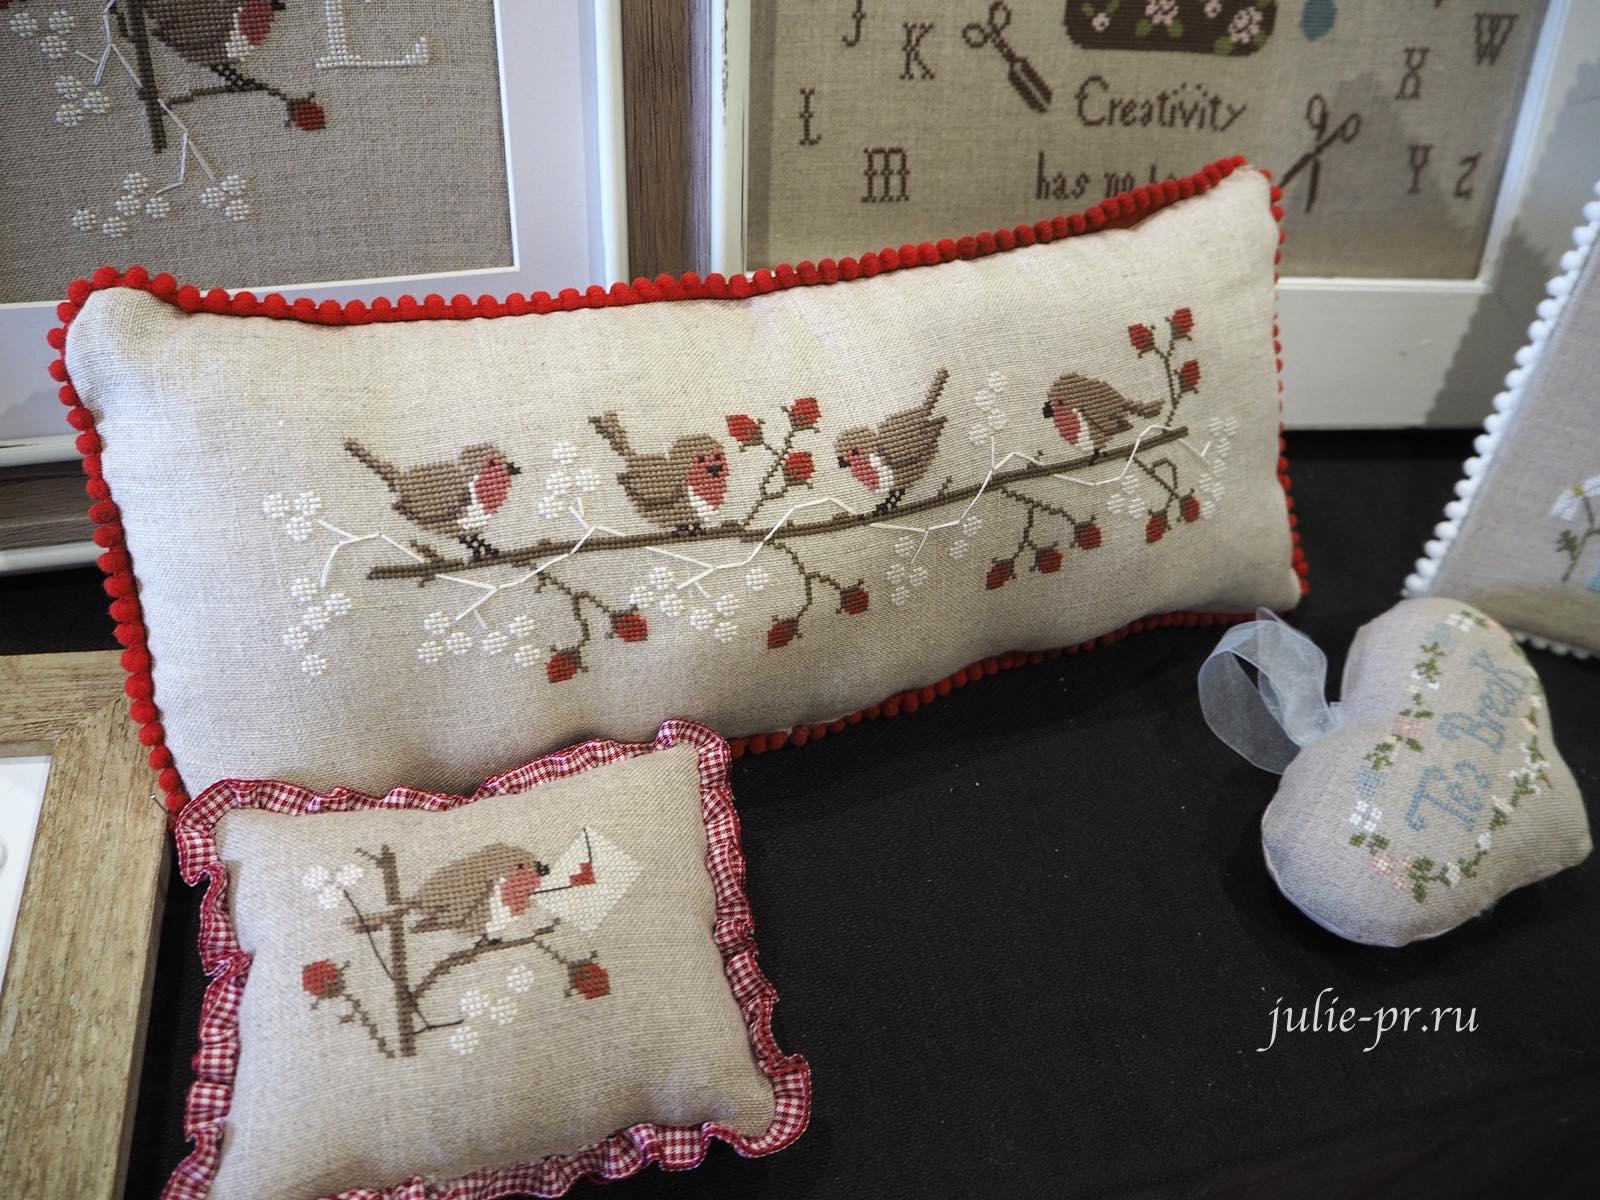 Madame Chantilly, Berries and robins, Ягоды и малиновки, вышивка крестом